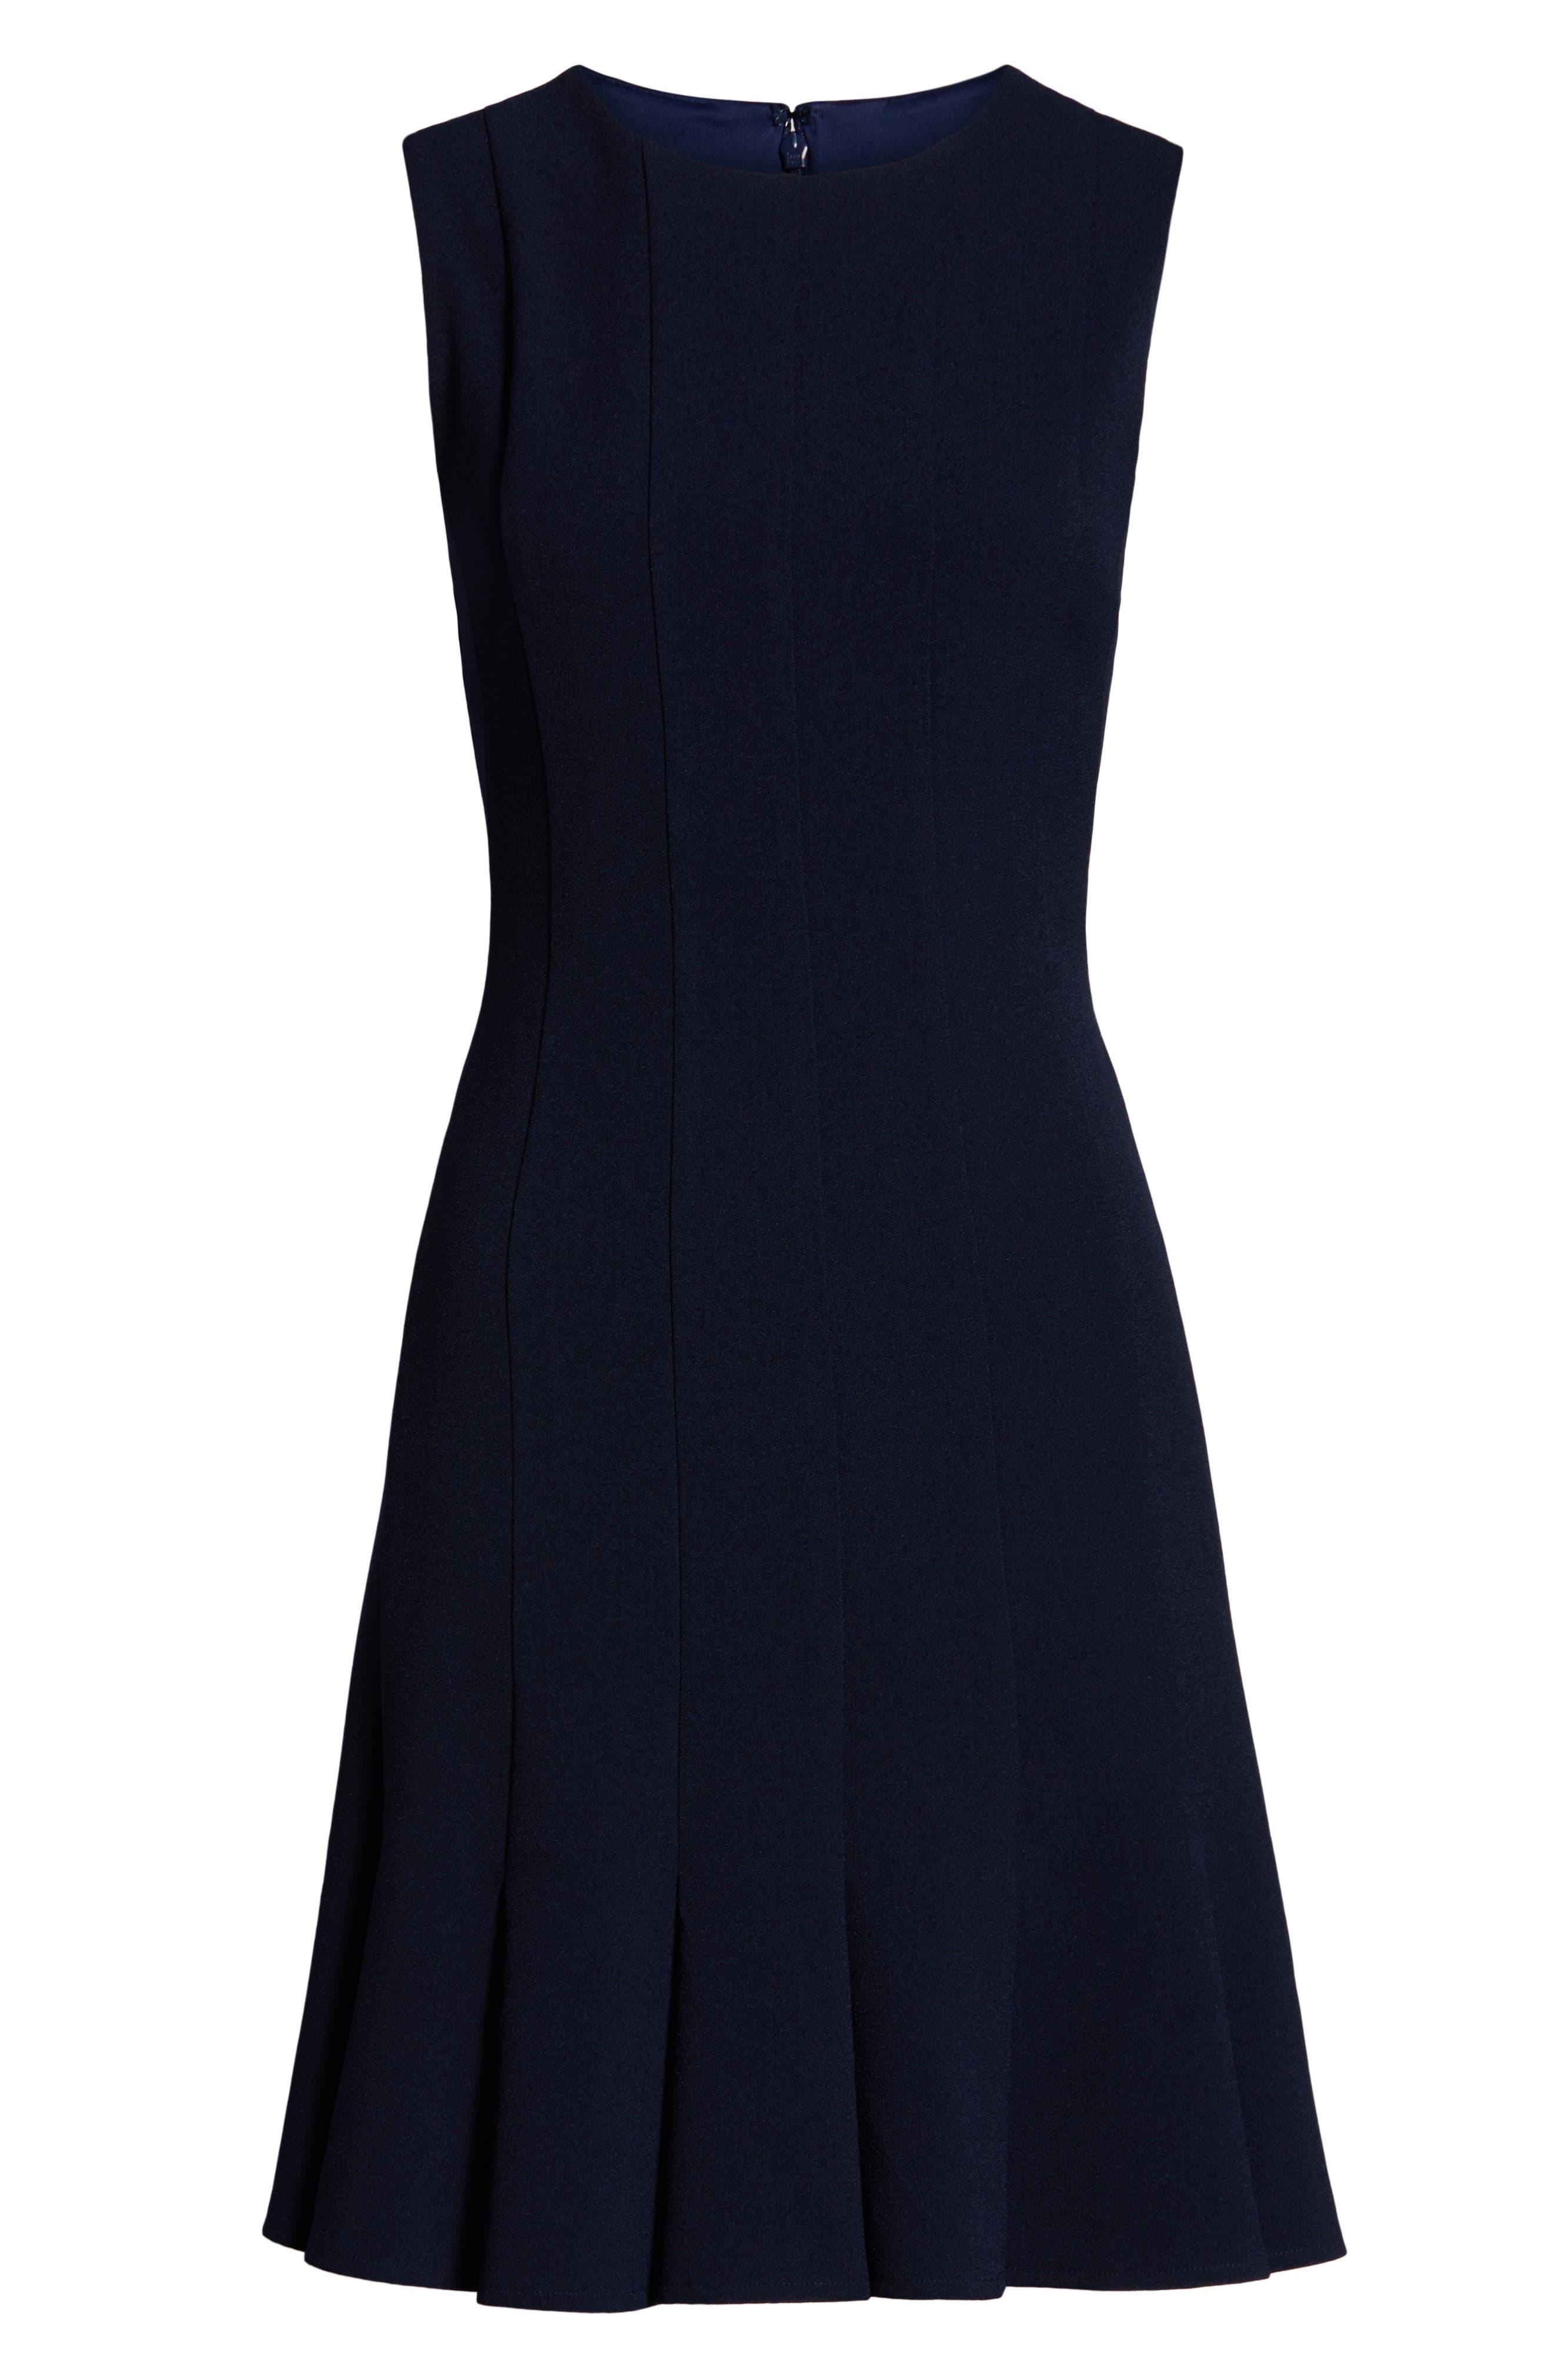 JULIA JORDAN, Sleeveless Pleat Panel Fit & Flare Dress, Alternate thumbnail 7, color, NAVY